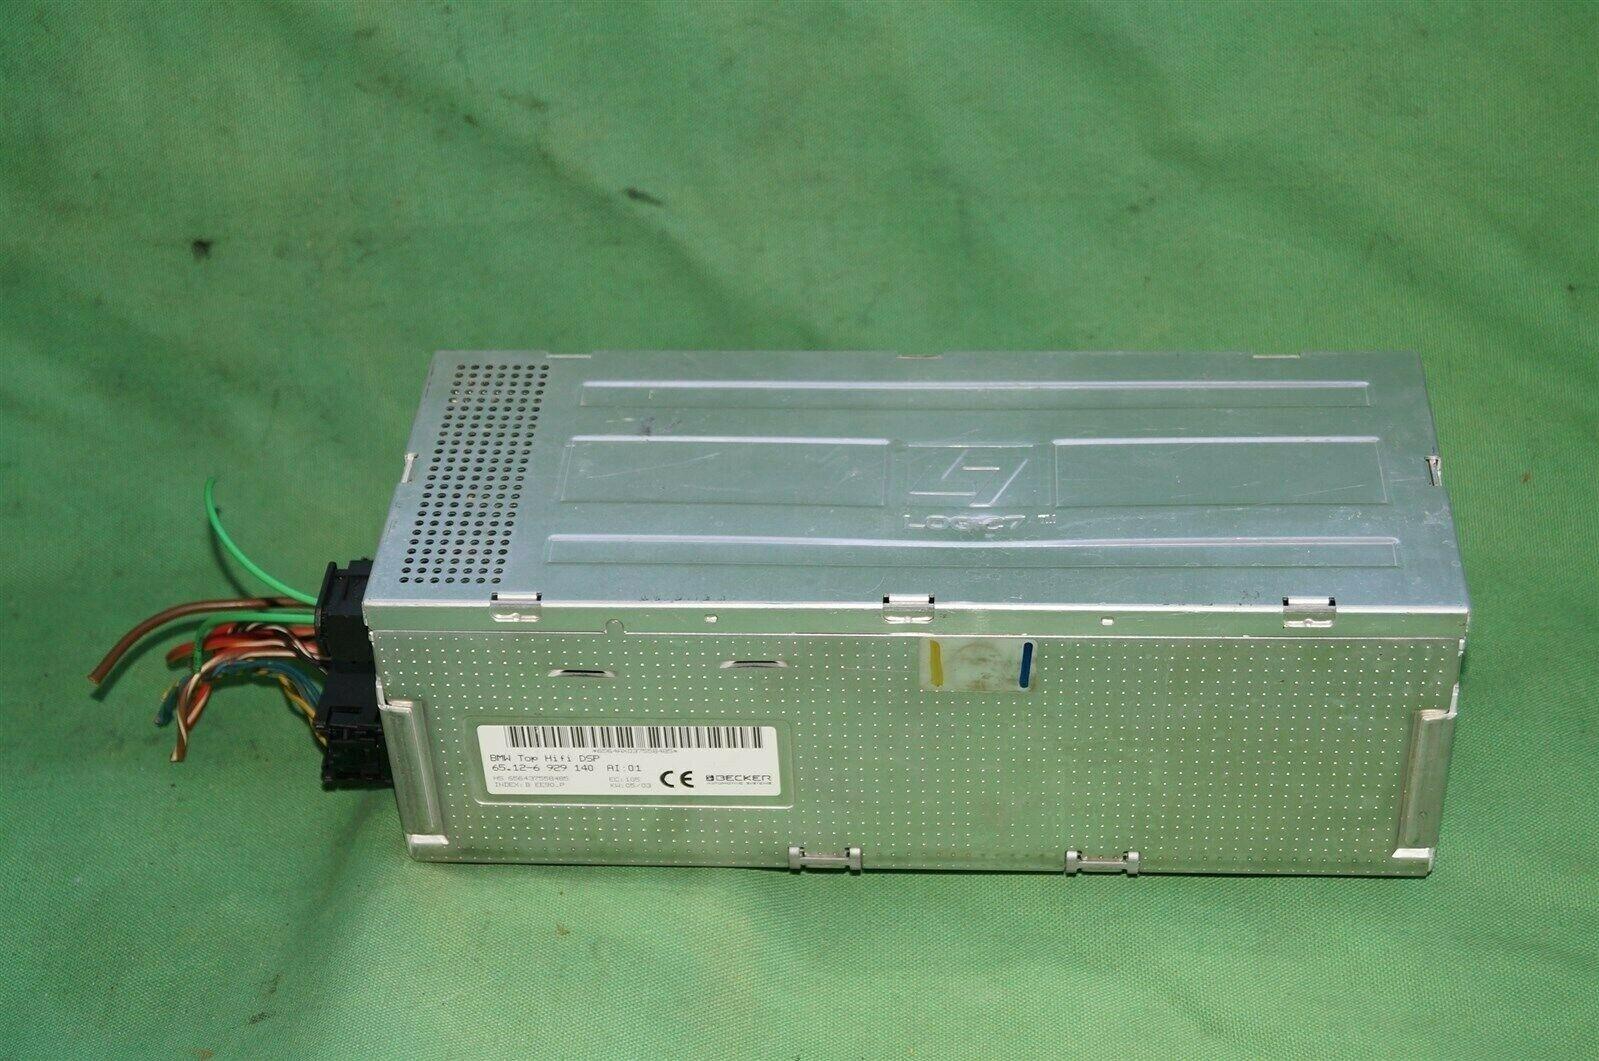 BMW Top Hifi DSP Logic 7 Amplifier Amp 65.12-6 929 140 Herman Becker